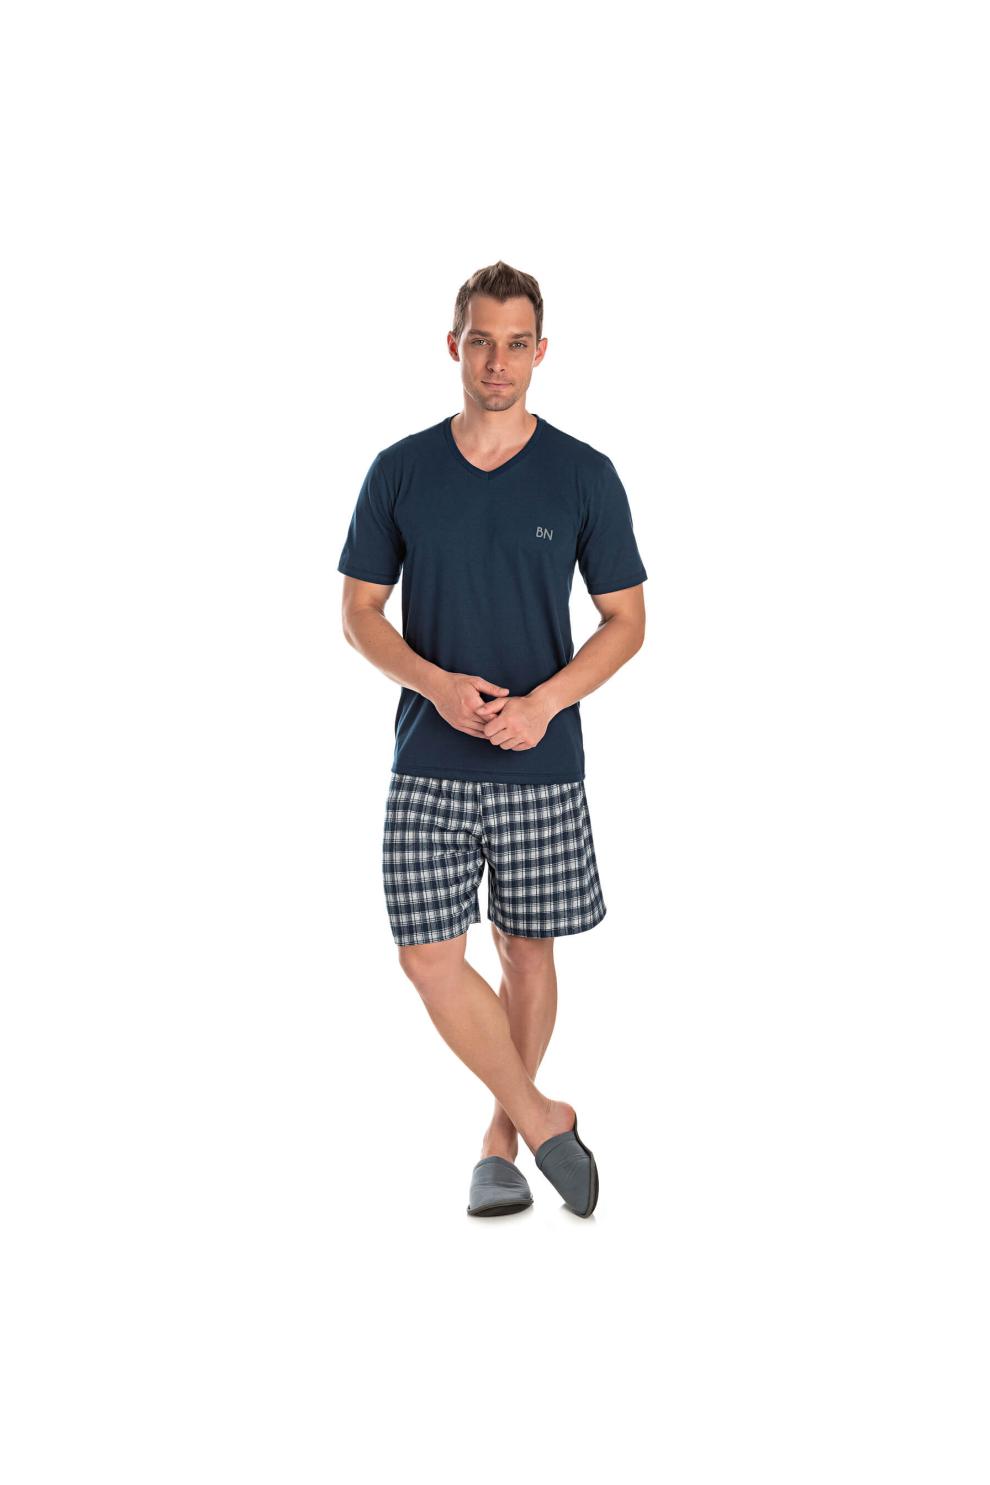 025/D - Pijama Adulto Masculino Bermuda Meia Estação Xadrez